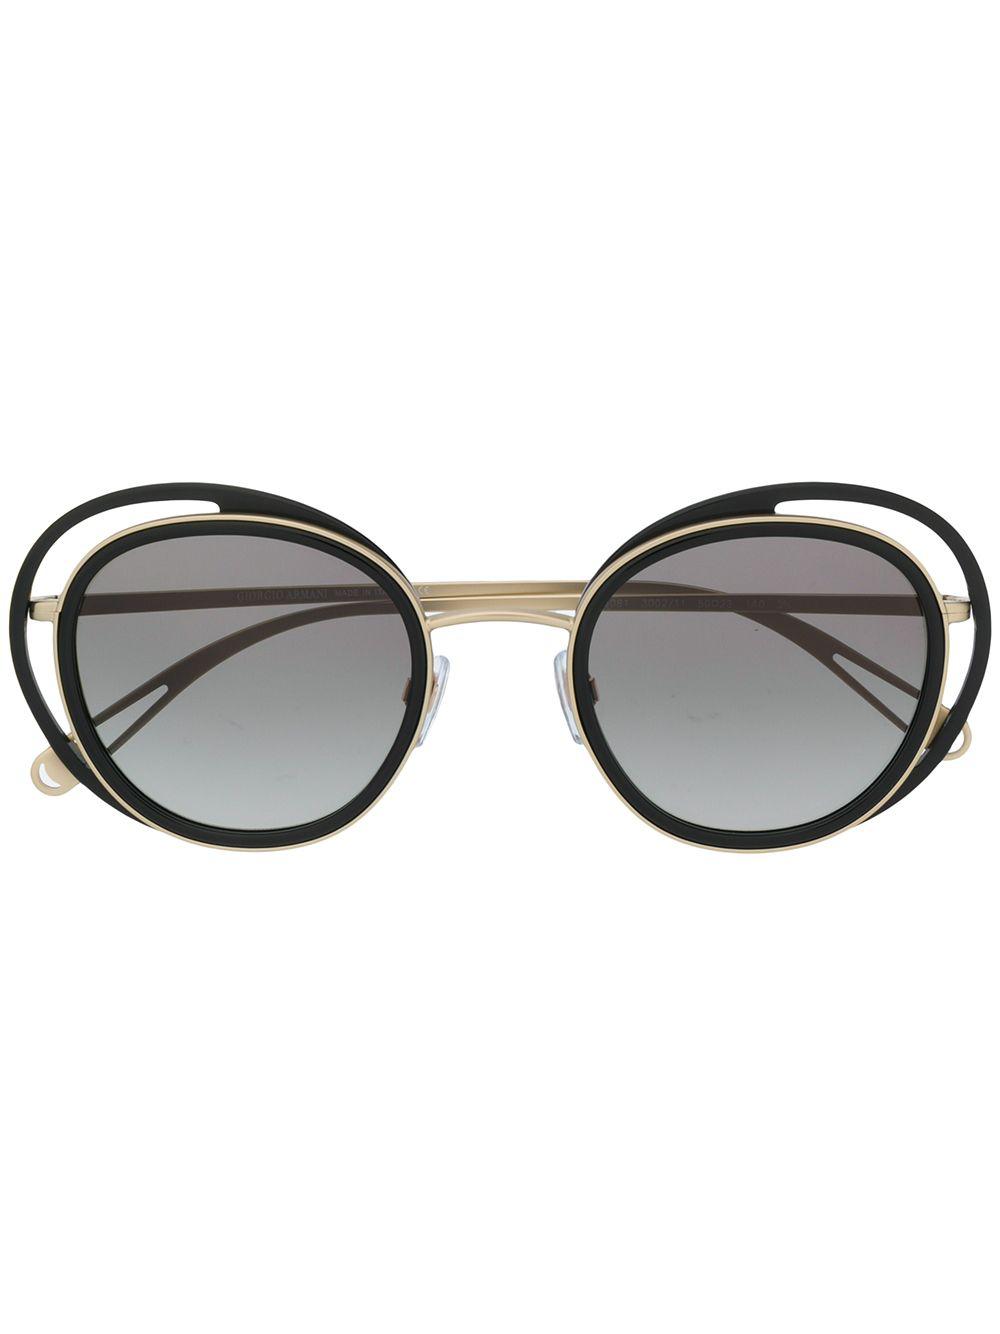 28390f28c9d Giorgio Armani Oversized Sunglasses - Metallic. Farfetch